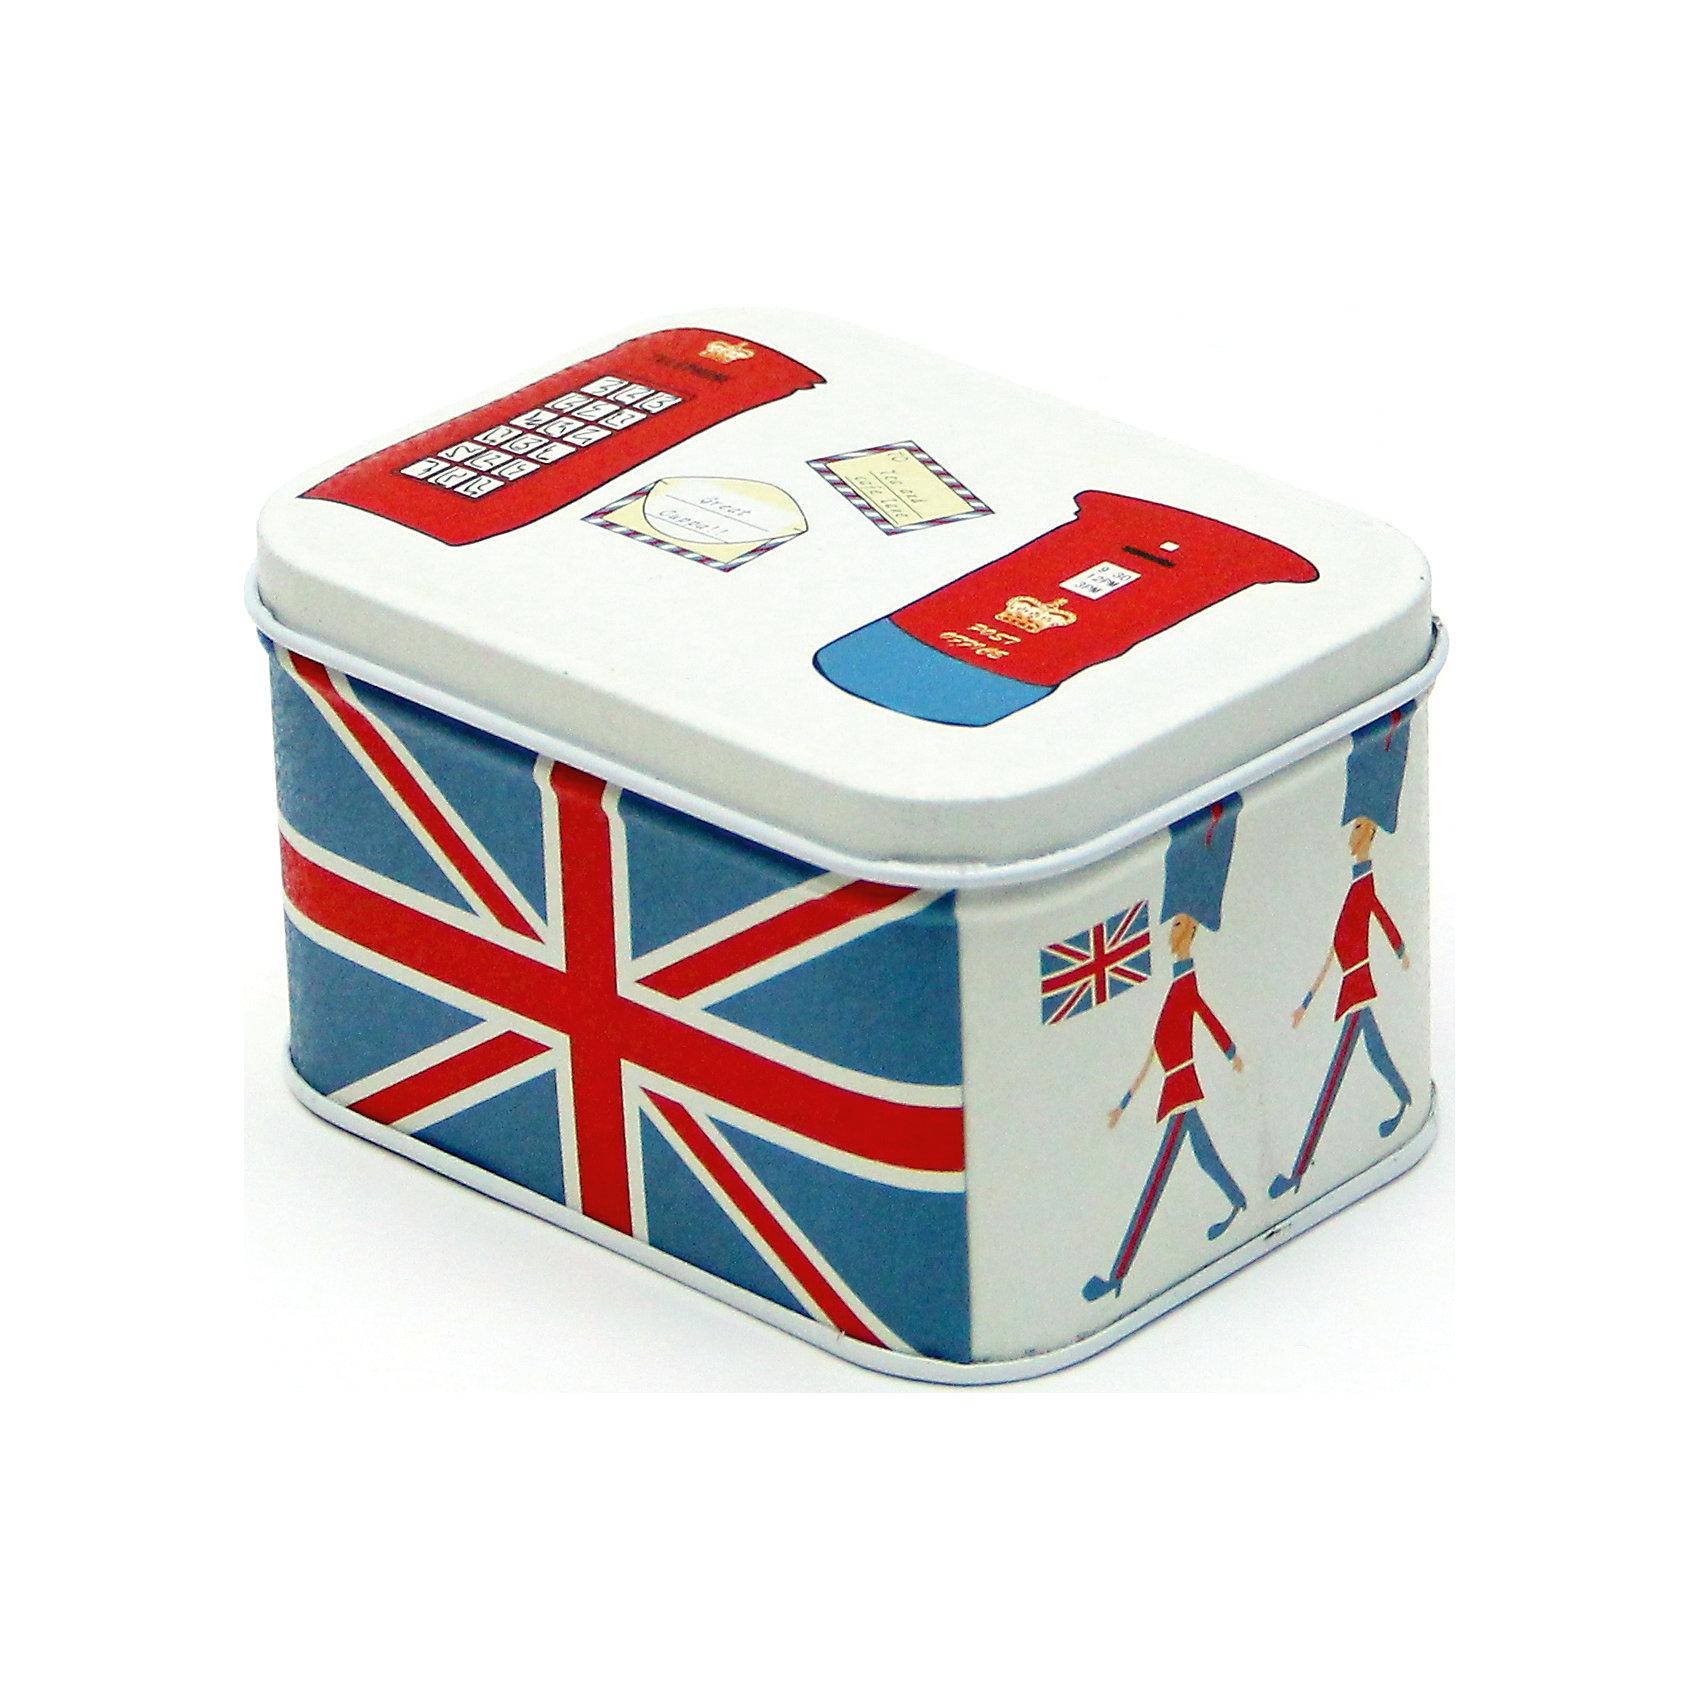 Феникс-Презент Коробка для мелочей Лондон 10,5*8*6 см подсвечник декоративный феникс презент цвет розовый 8 5 х 8 5 х 7 5 см